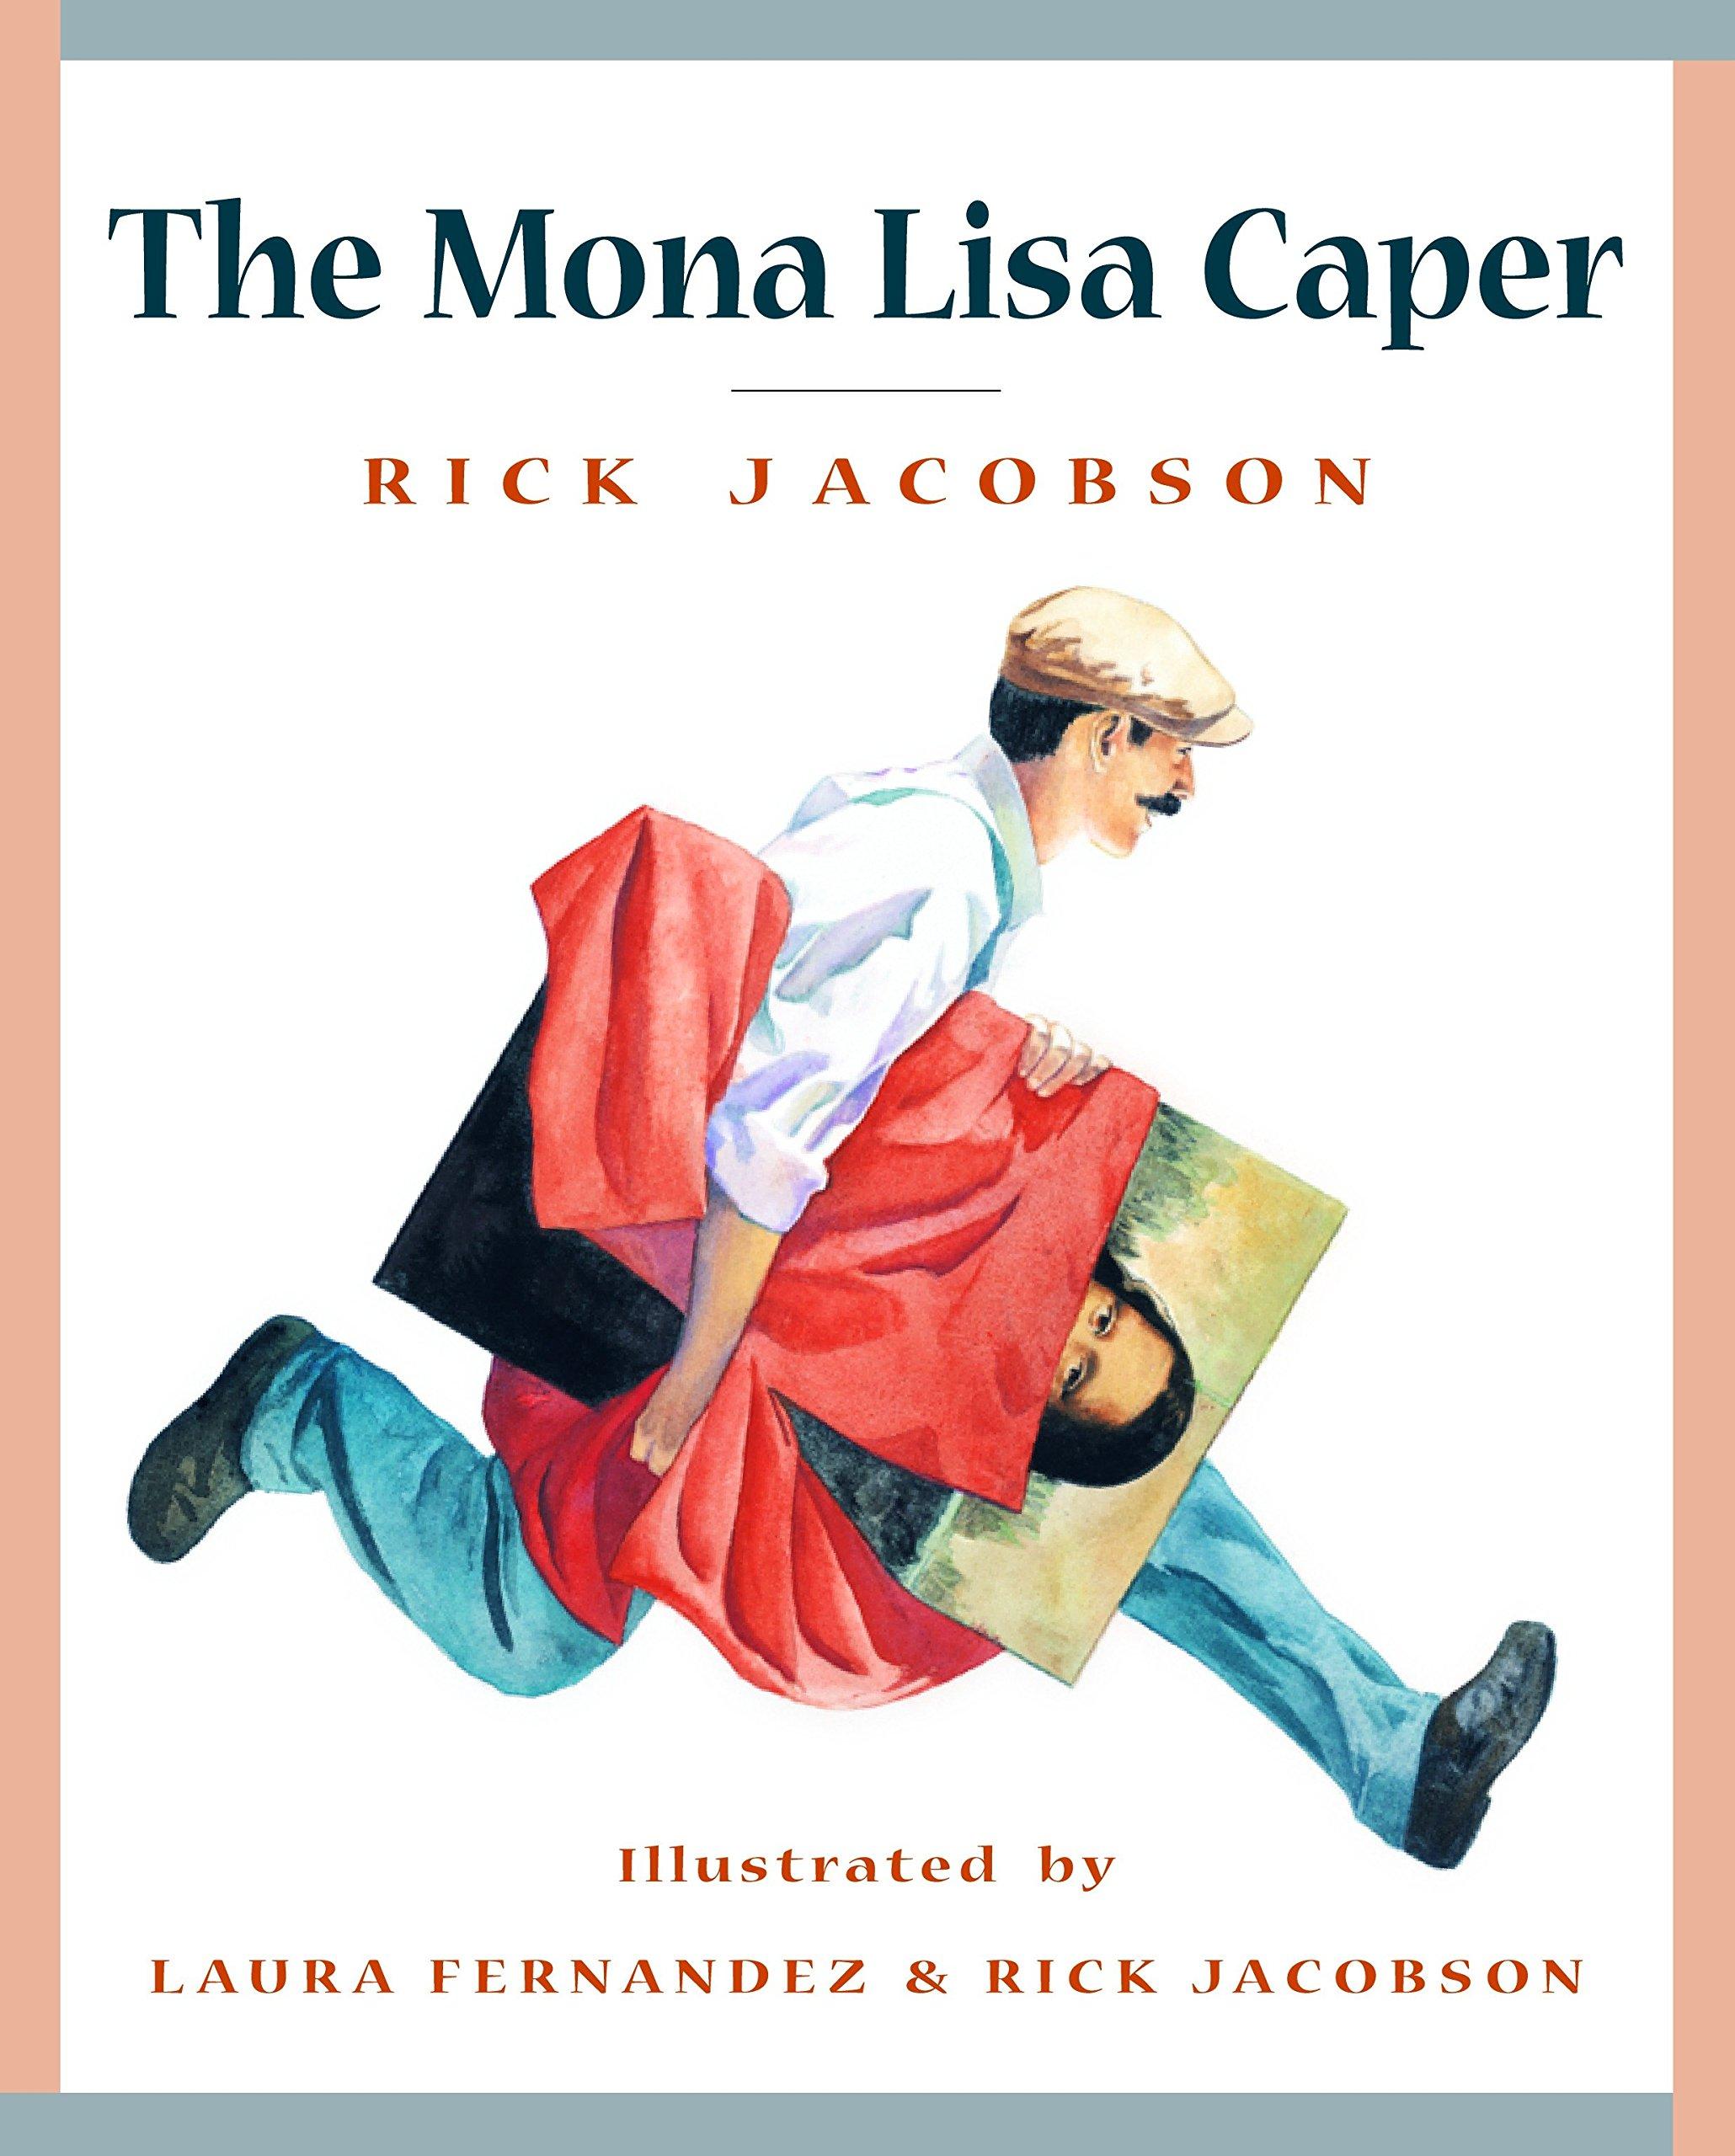 The Mona Lisa Caper